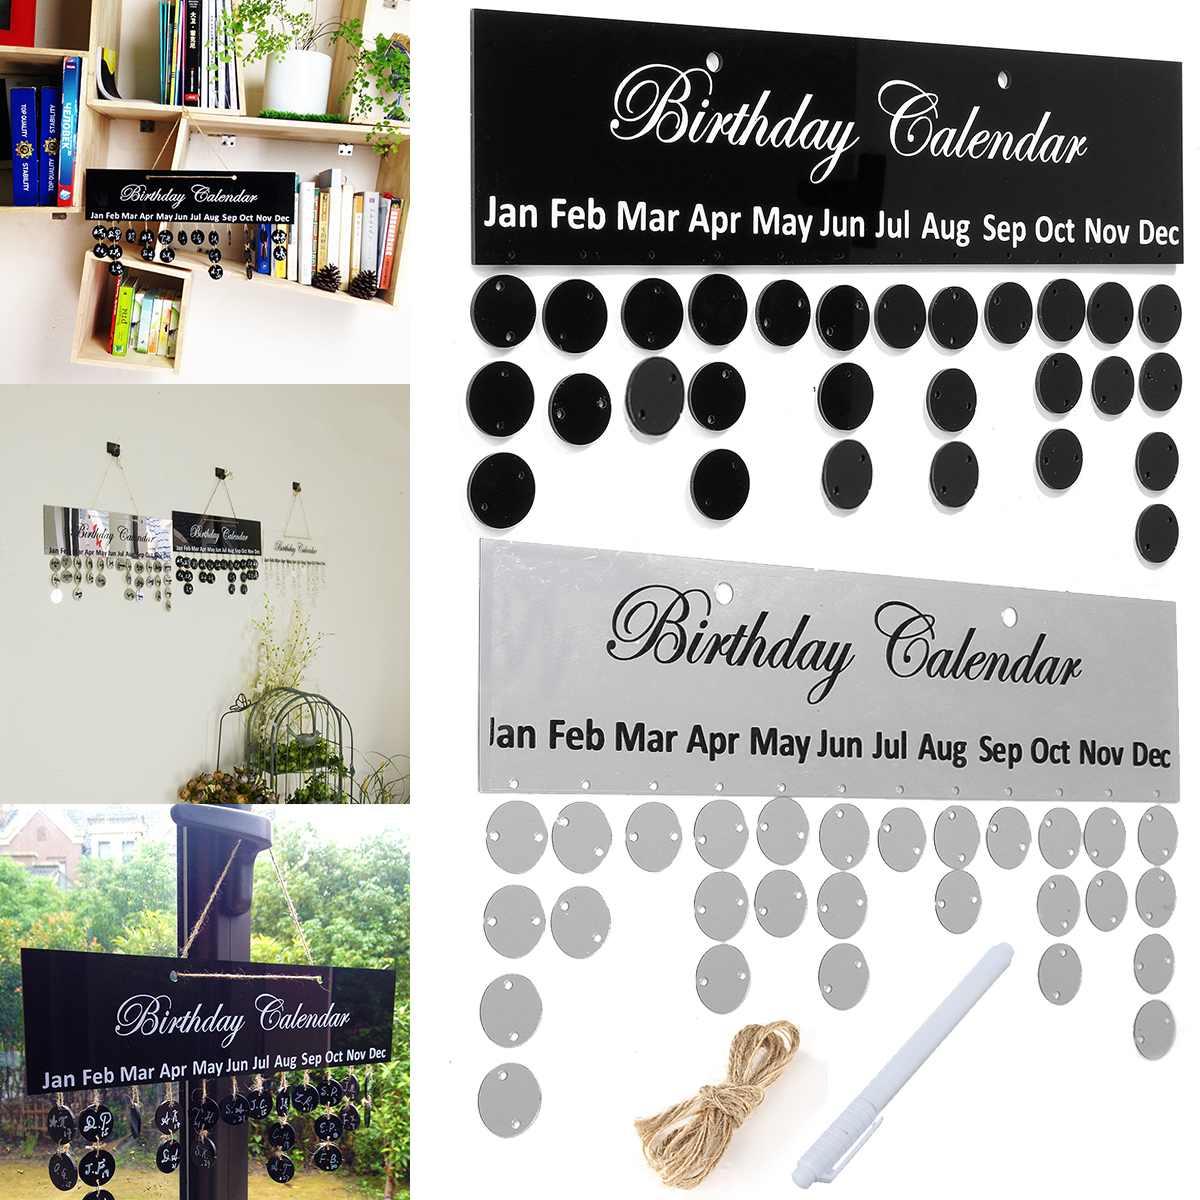 Kicute 1pc Silver Black Birthday Calendar Board DIY Family Birthday Calendar Sign Special Dates Planner Board Hanging Decor Gift